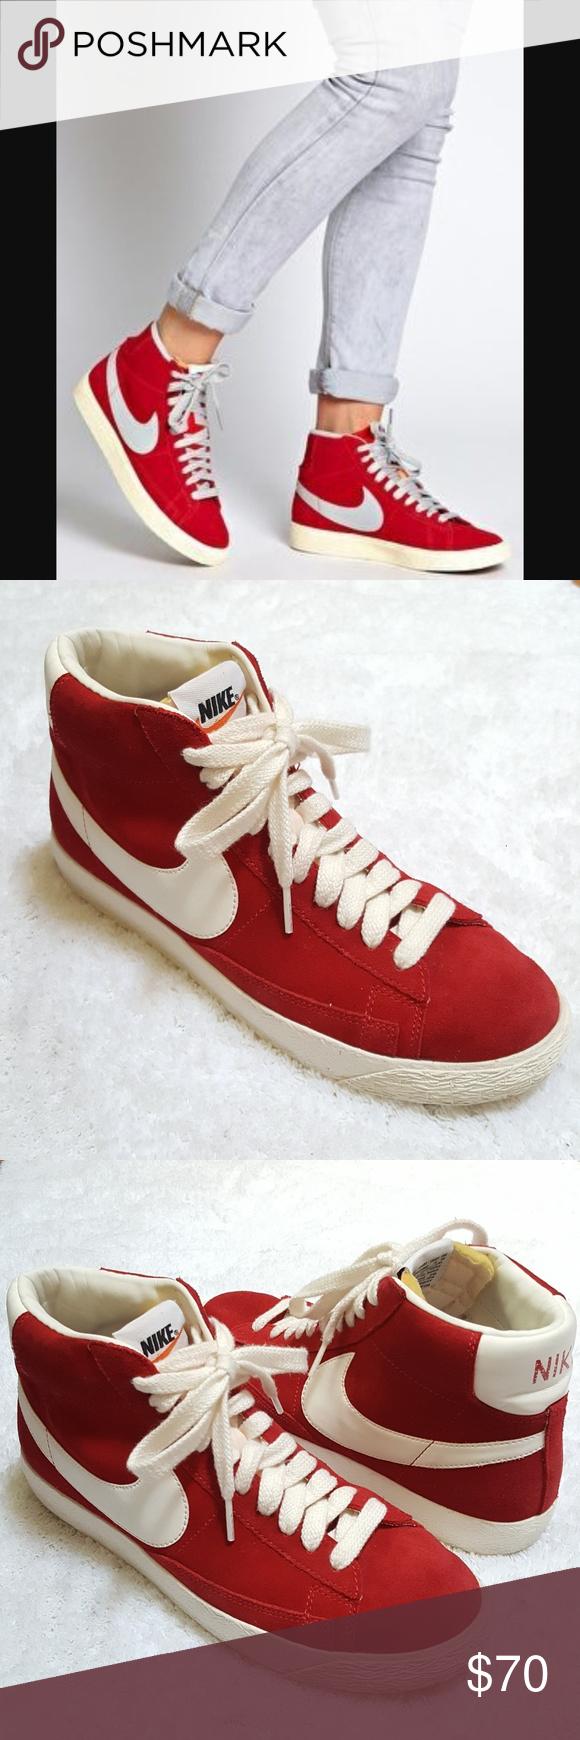 Nike Blazer x J. Crew Hi Tops